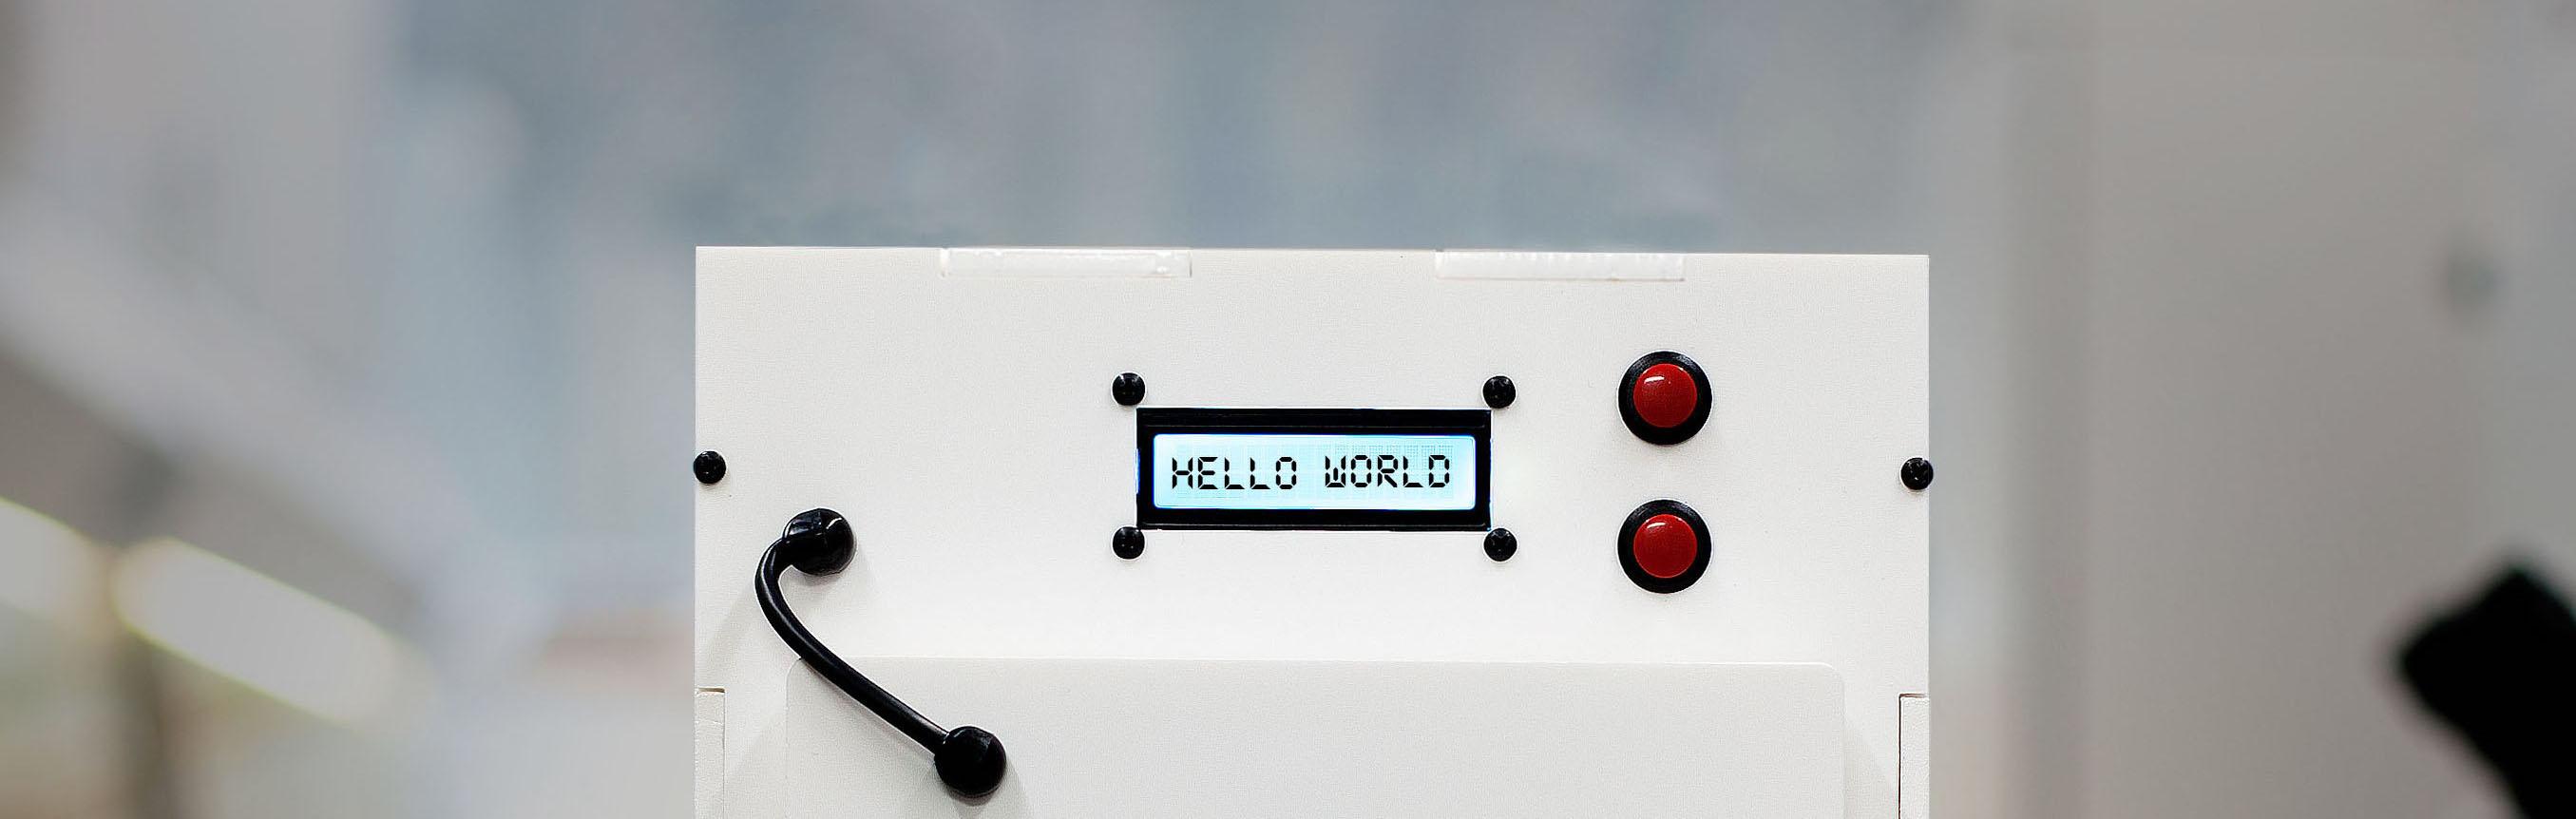 Hackable CO2 Incubator